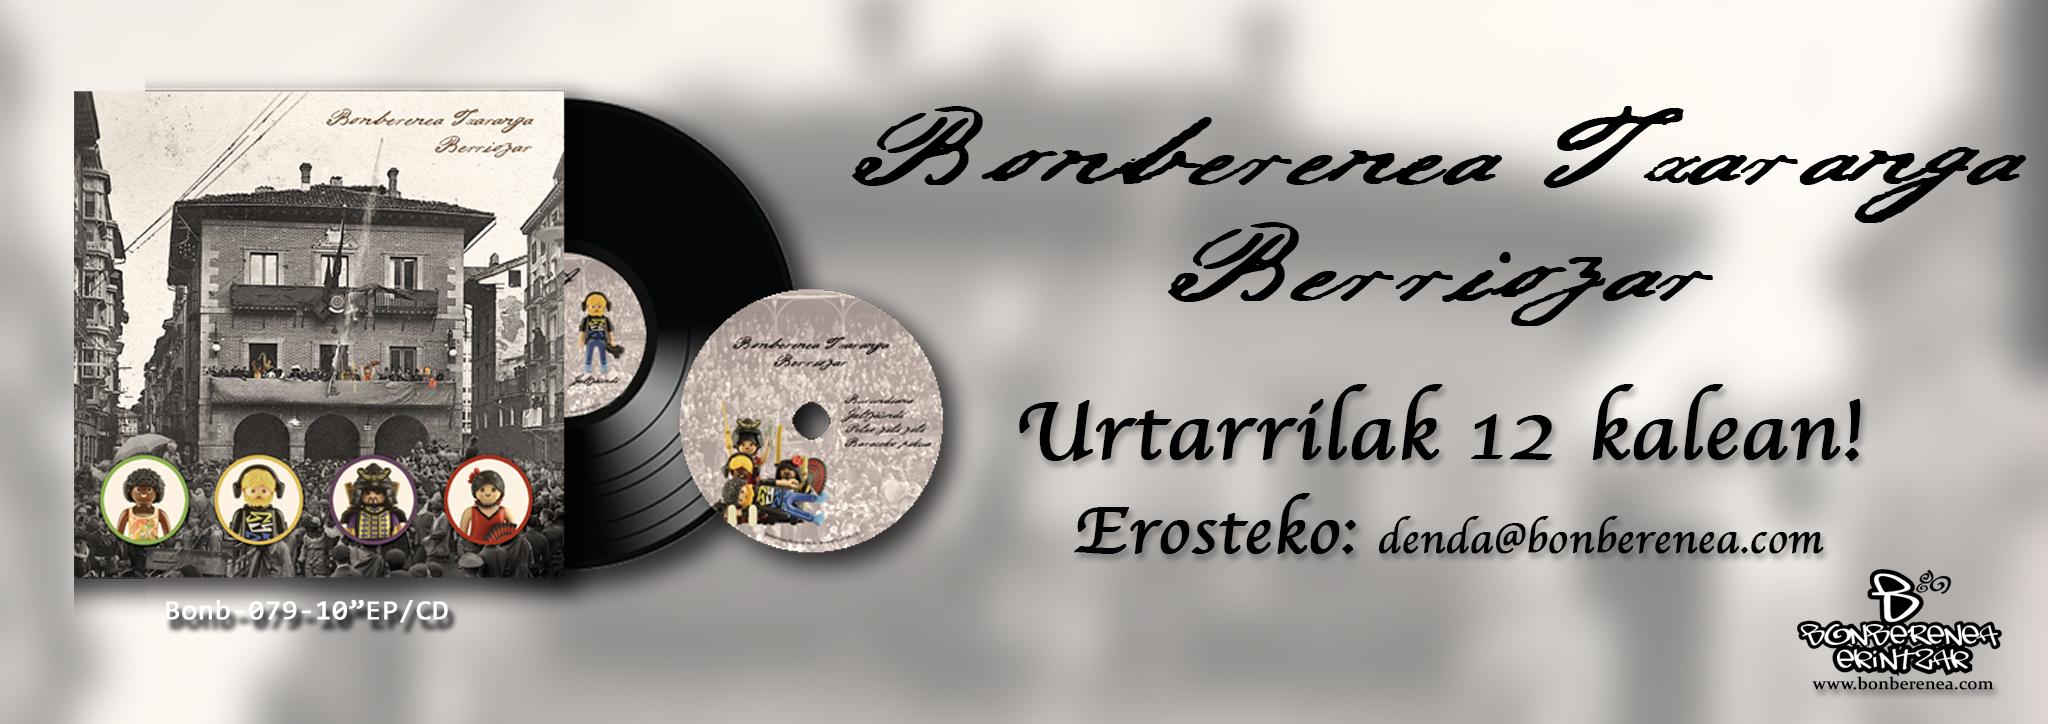 banner-txaranga-berriozar